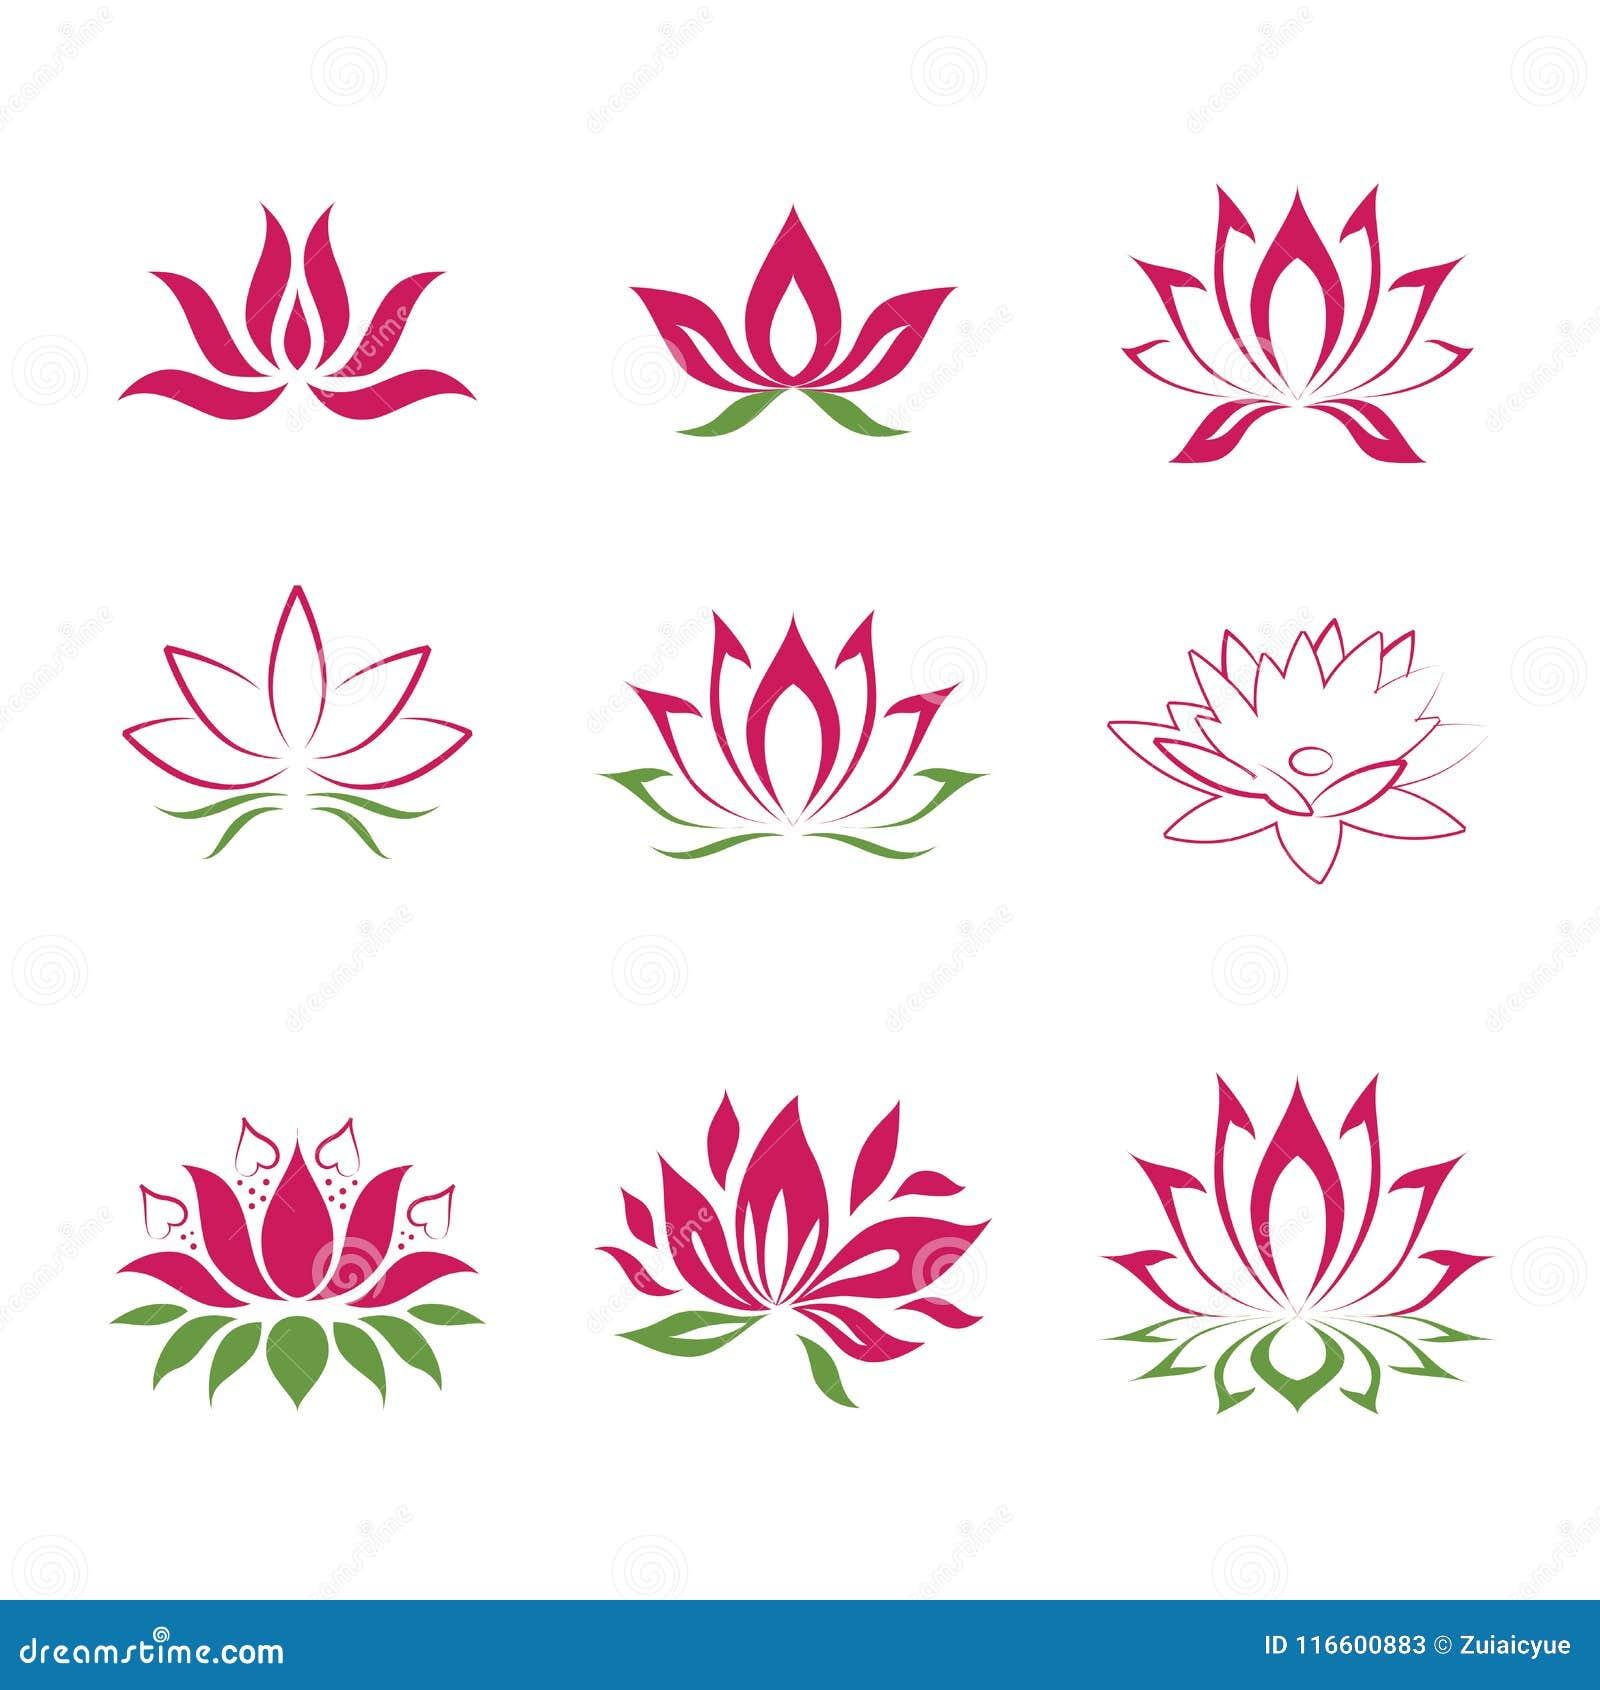 Lotus Flower Icons Stock Vector Illustration Of Logo 116600883